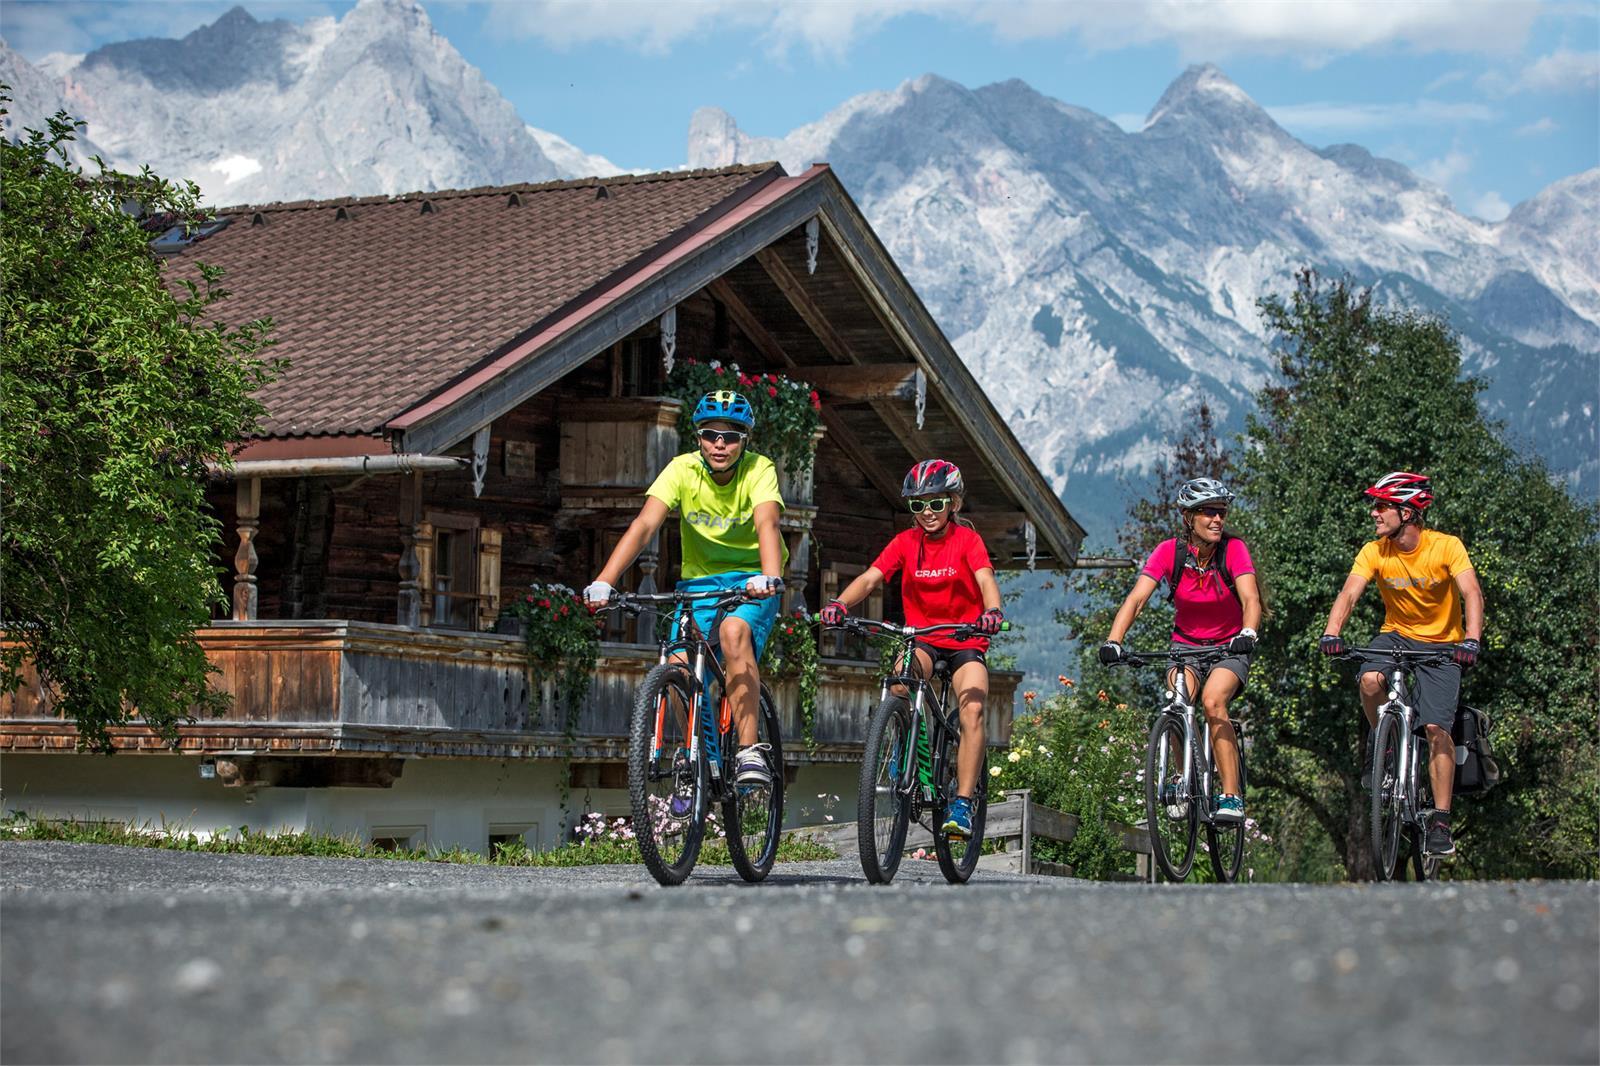 Familien-Radtour | ©Salzburgerland Tourismus - Markus Greber